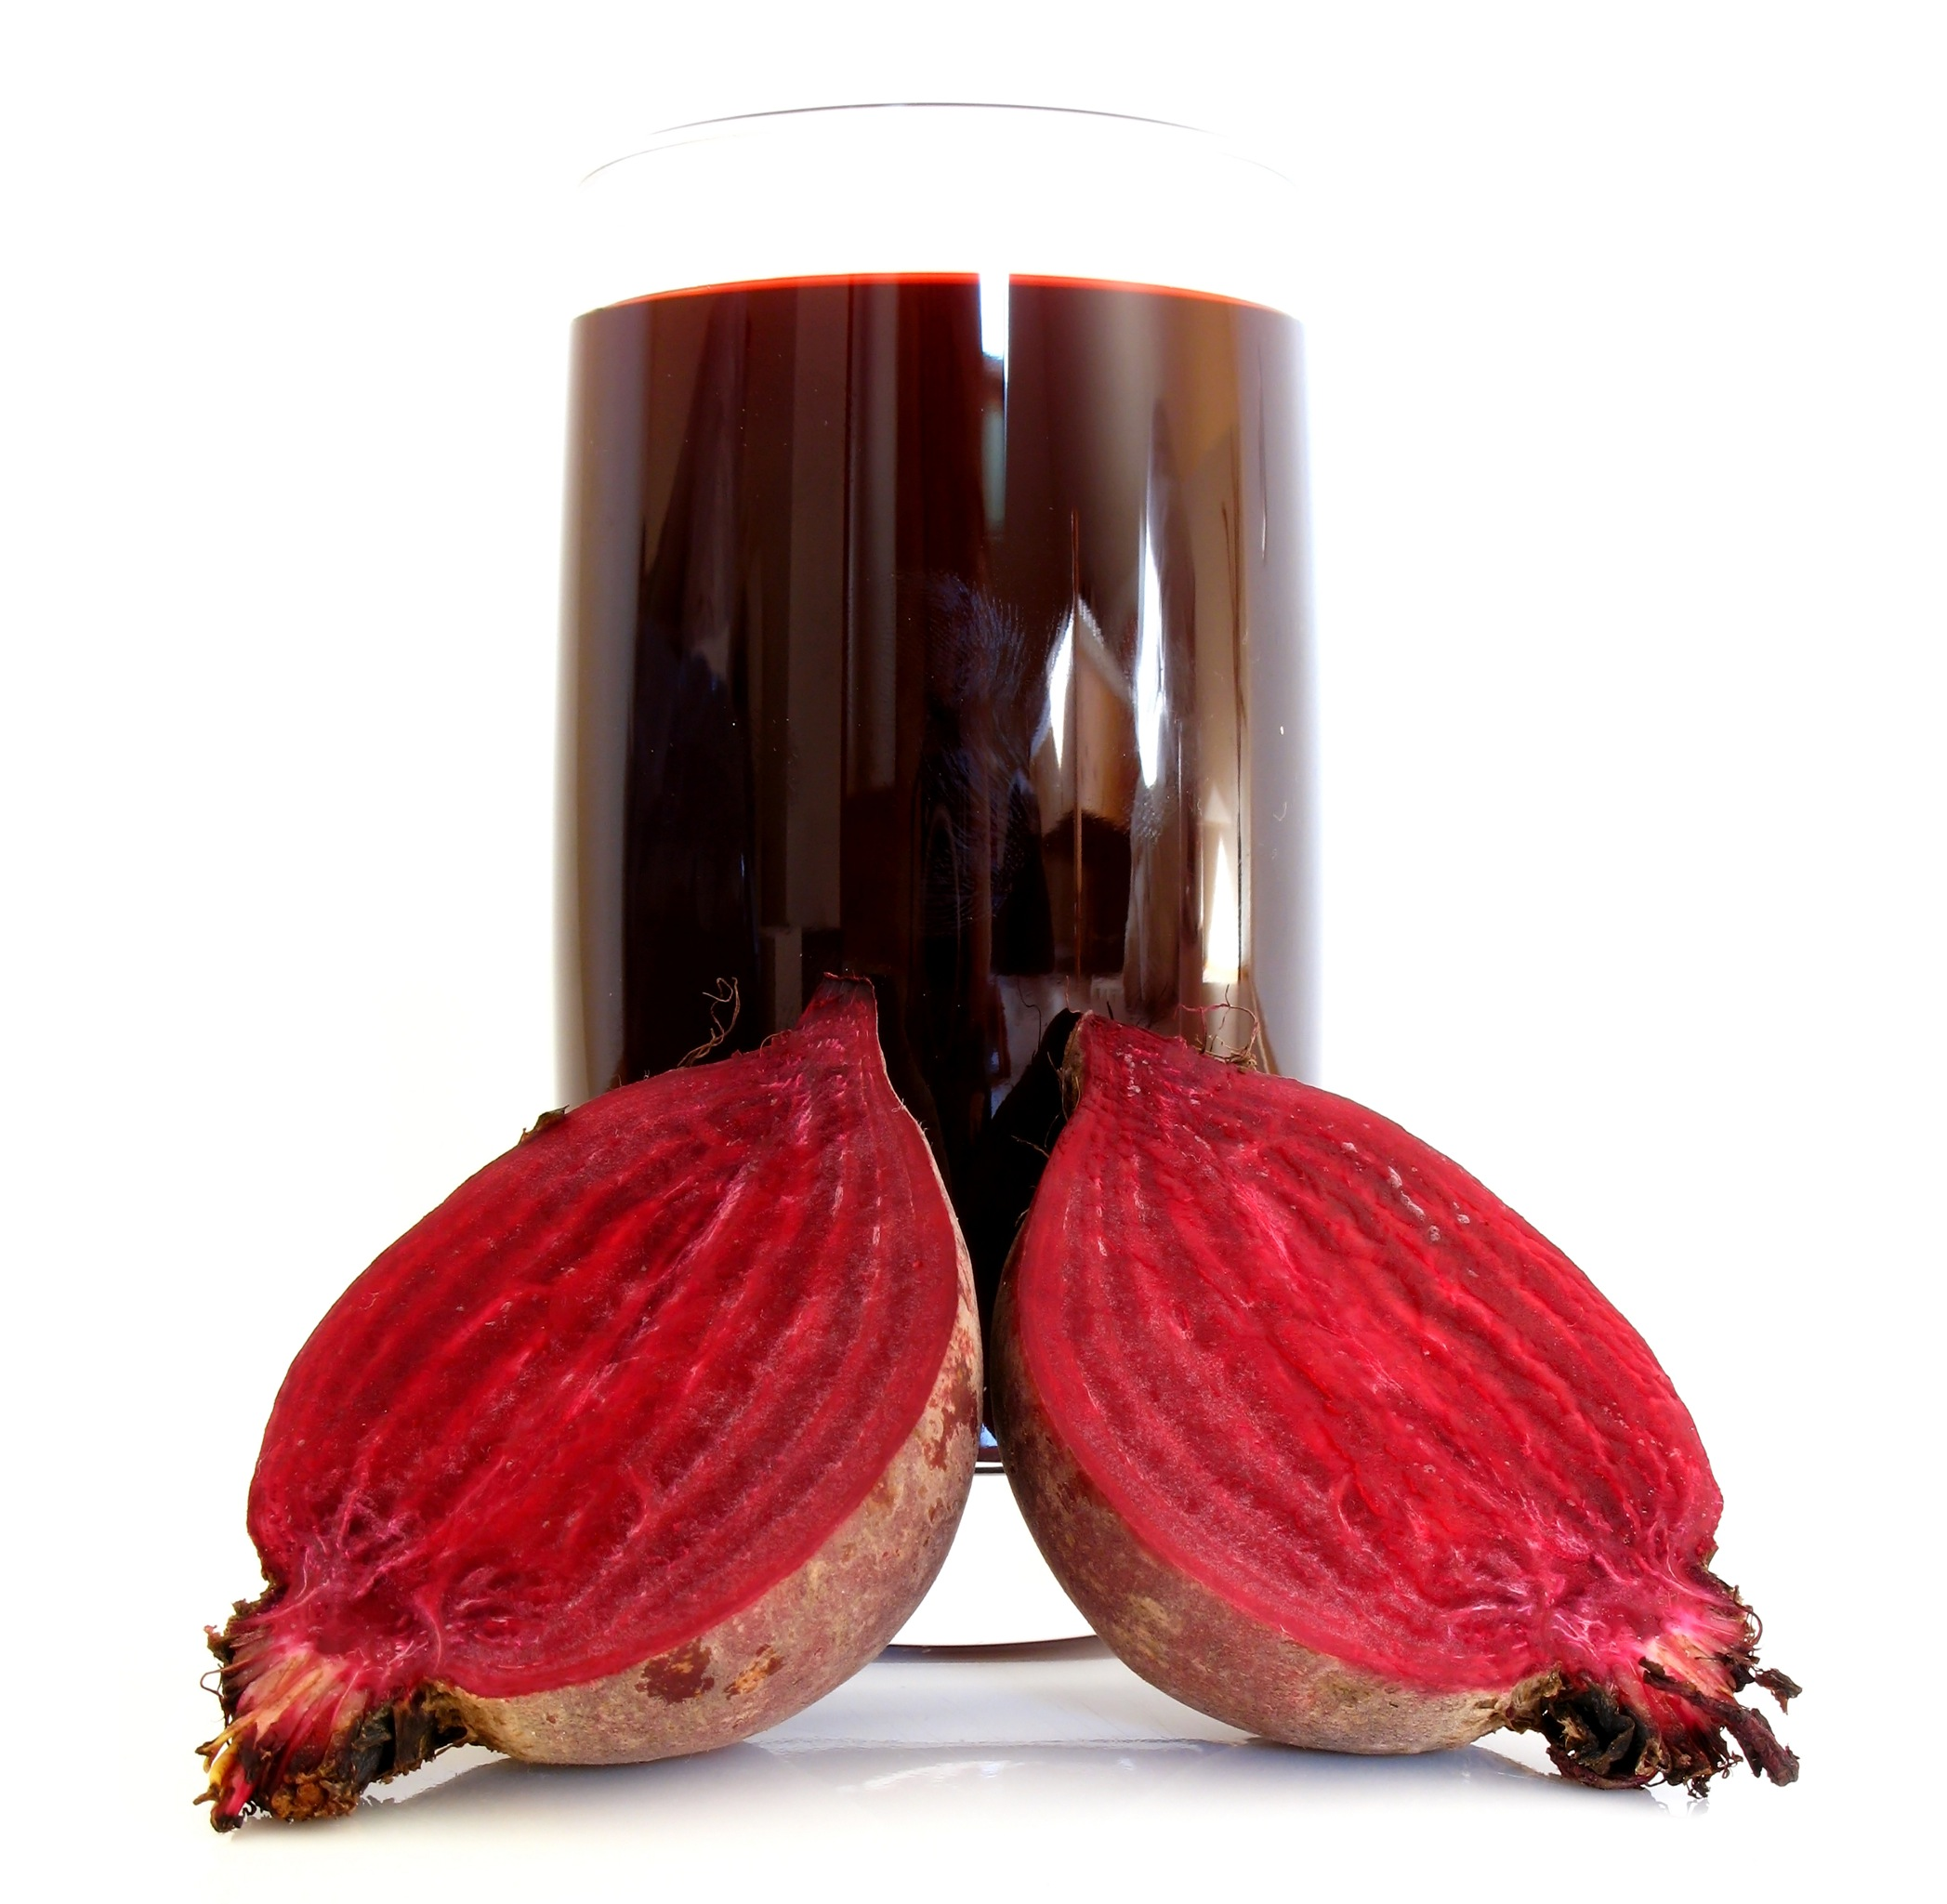 beets-heart-health